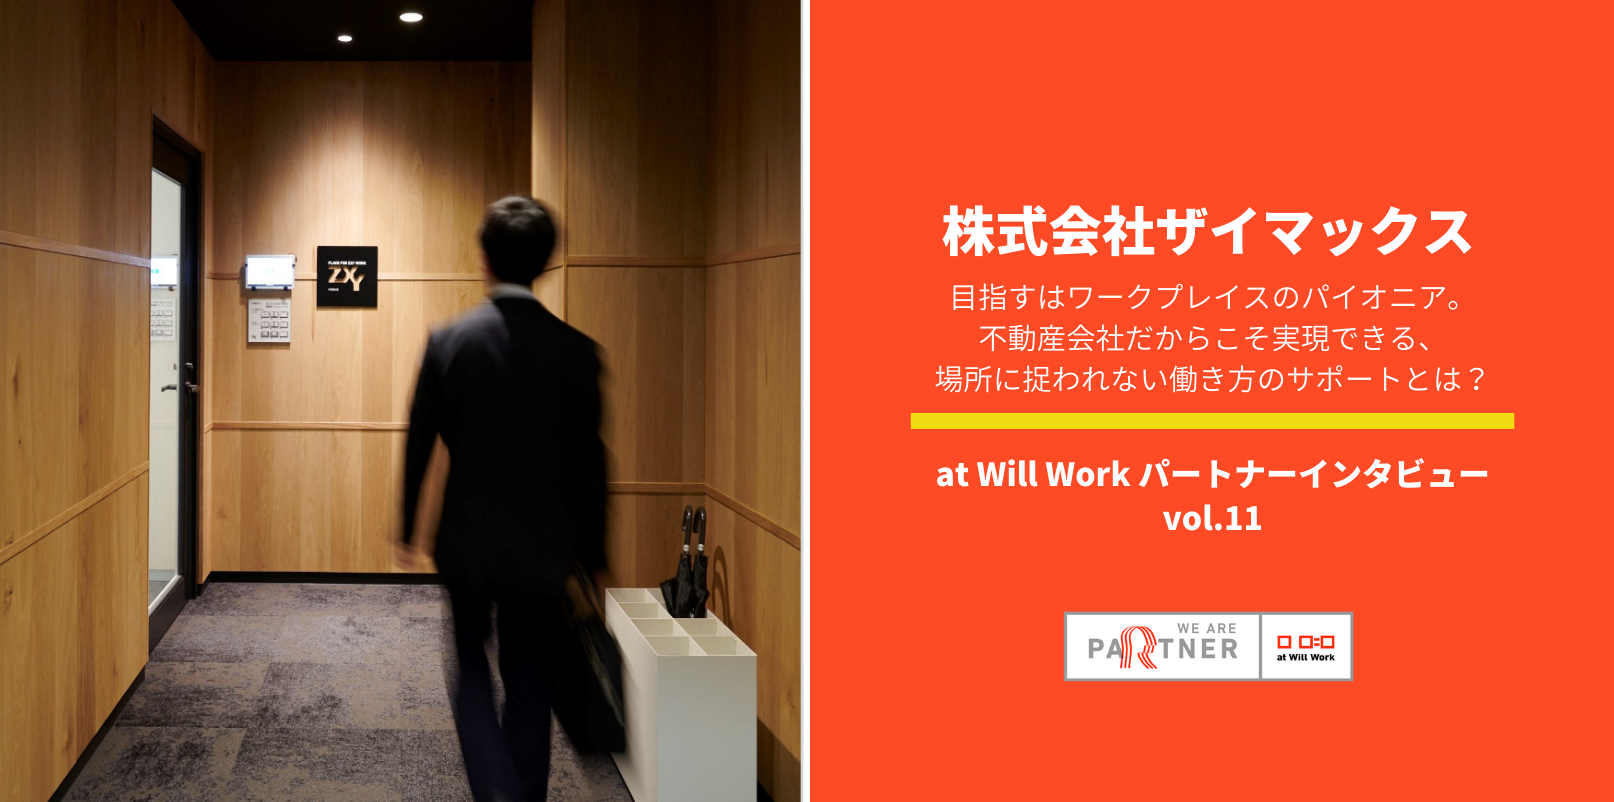 at Will Work パートナーインタビューザイマックスさま.png